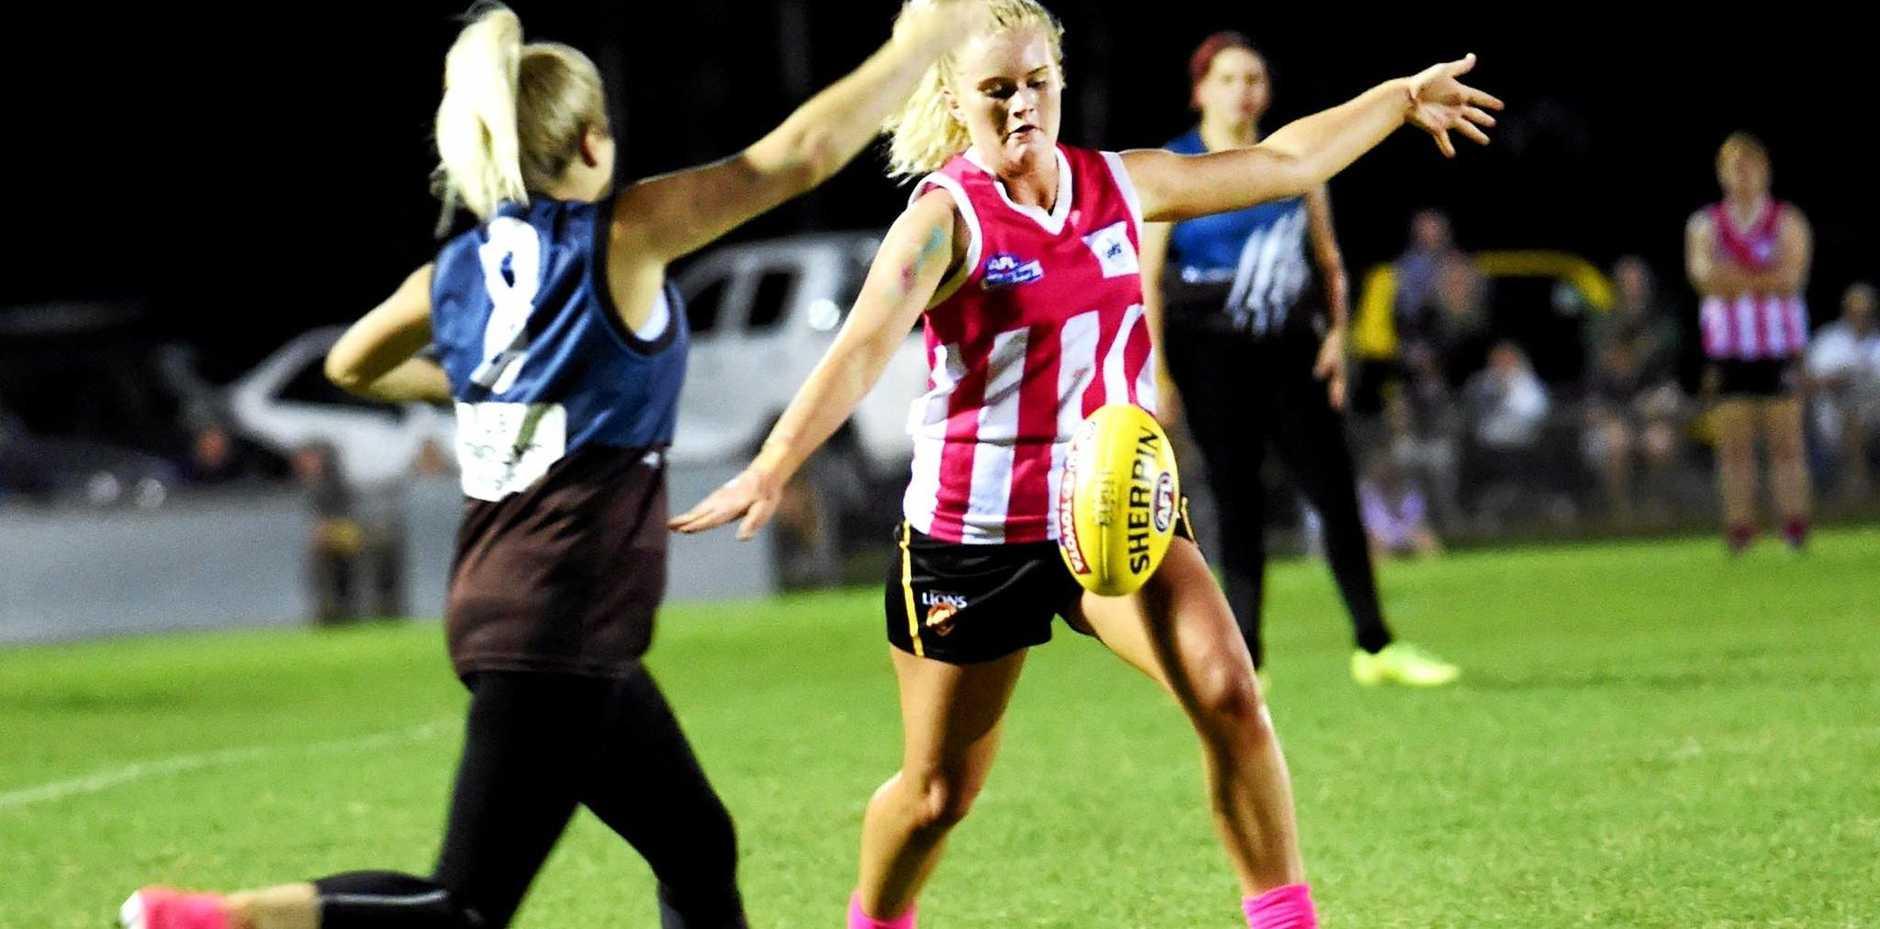 AFL Women's exhibition match - Hervey Bay Bombers versus Bay Power.